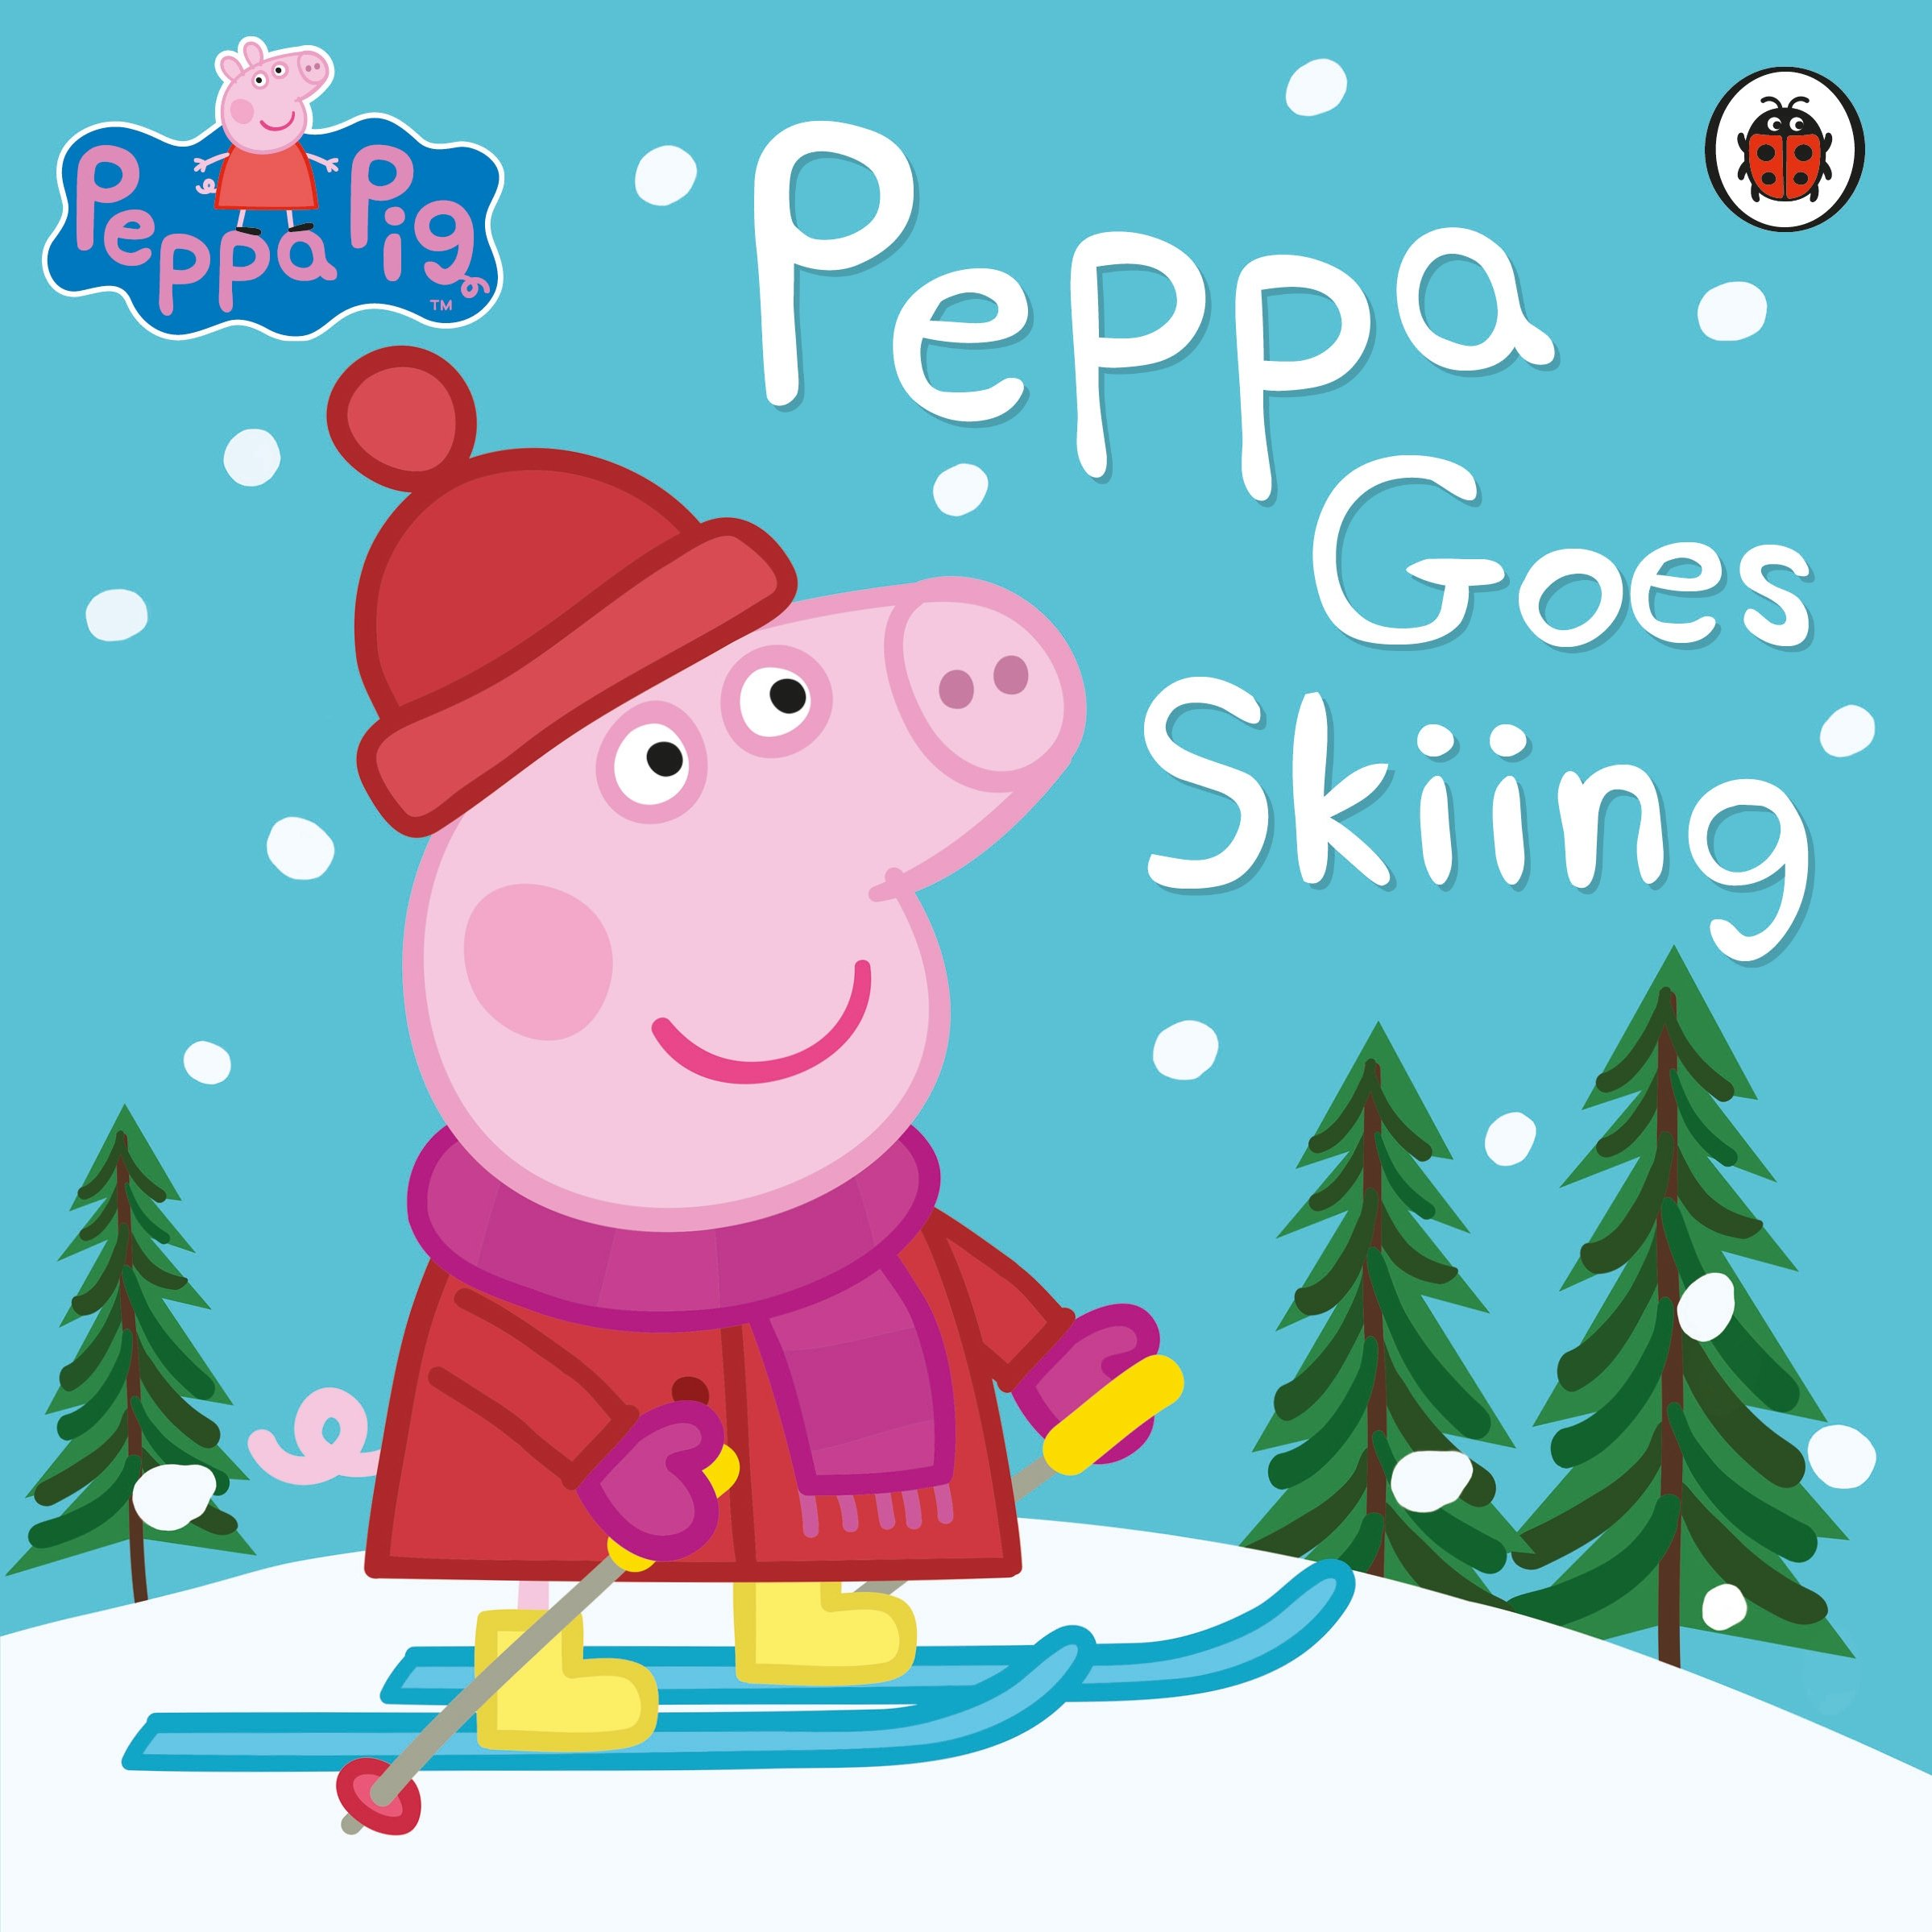 Peppa Pig Peppas First Sleepover Ladybird Goes Skiing